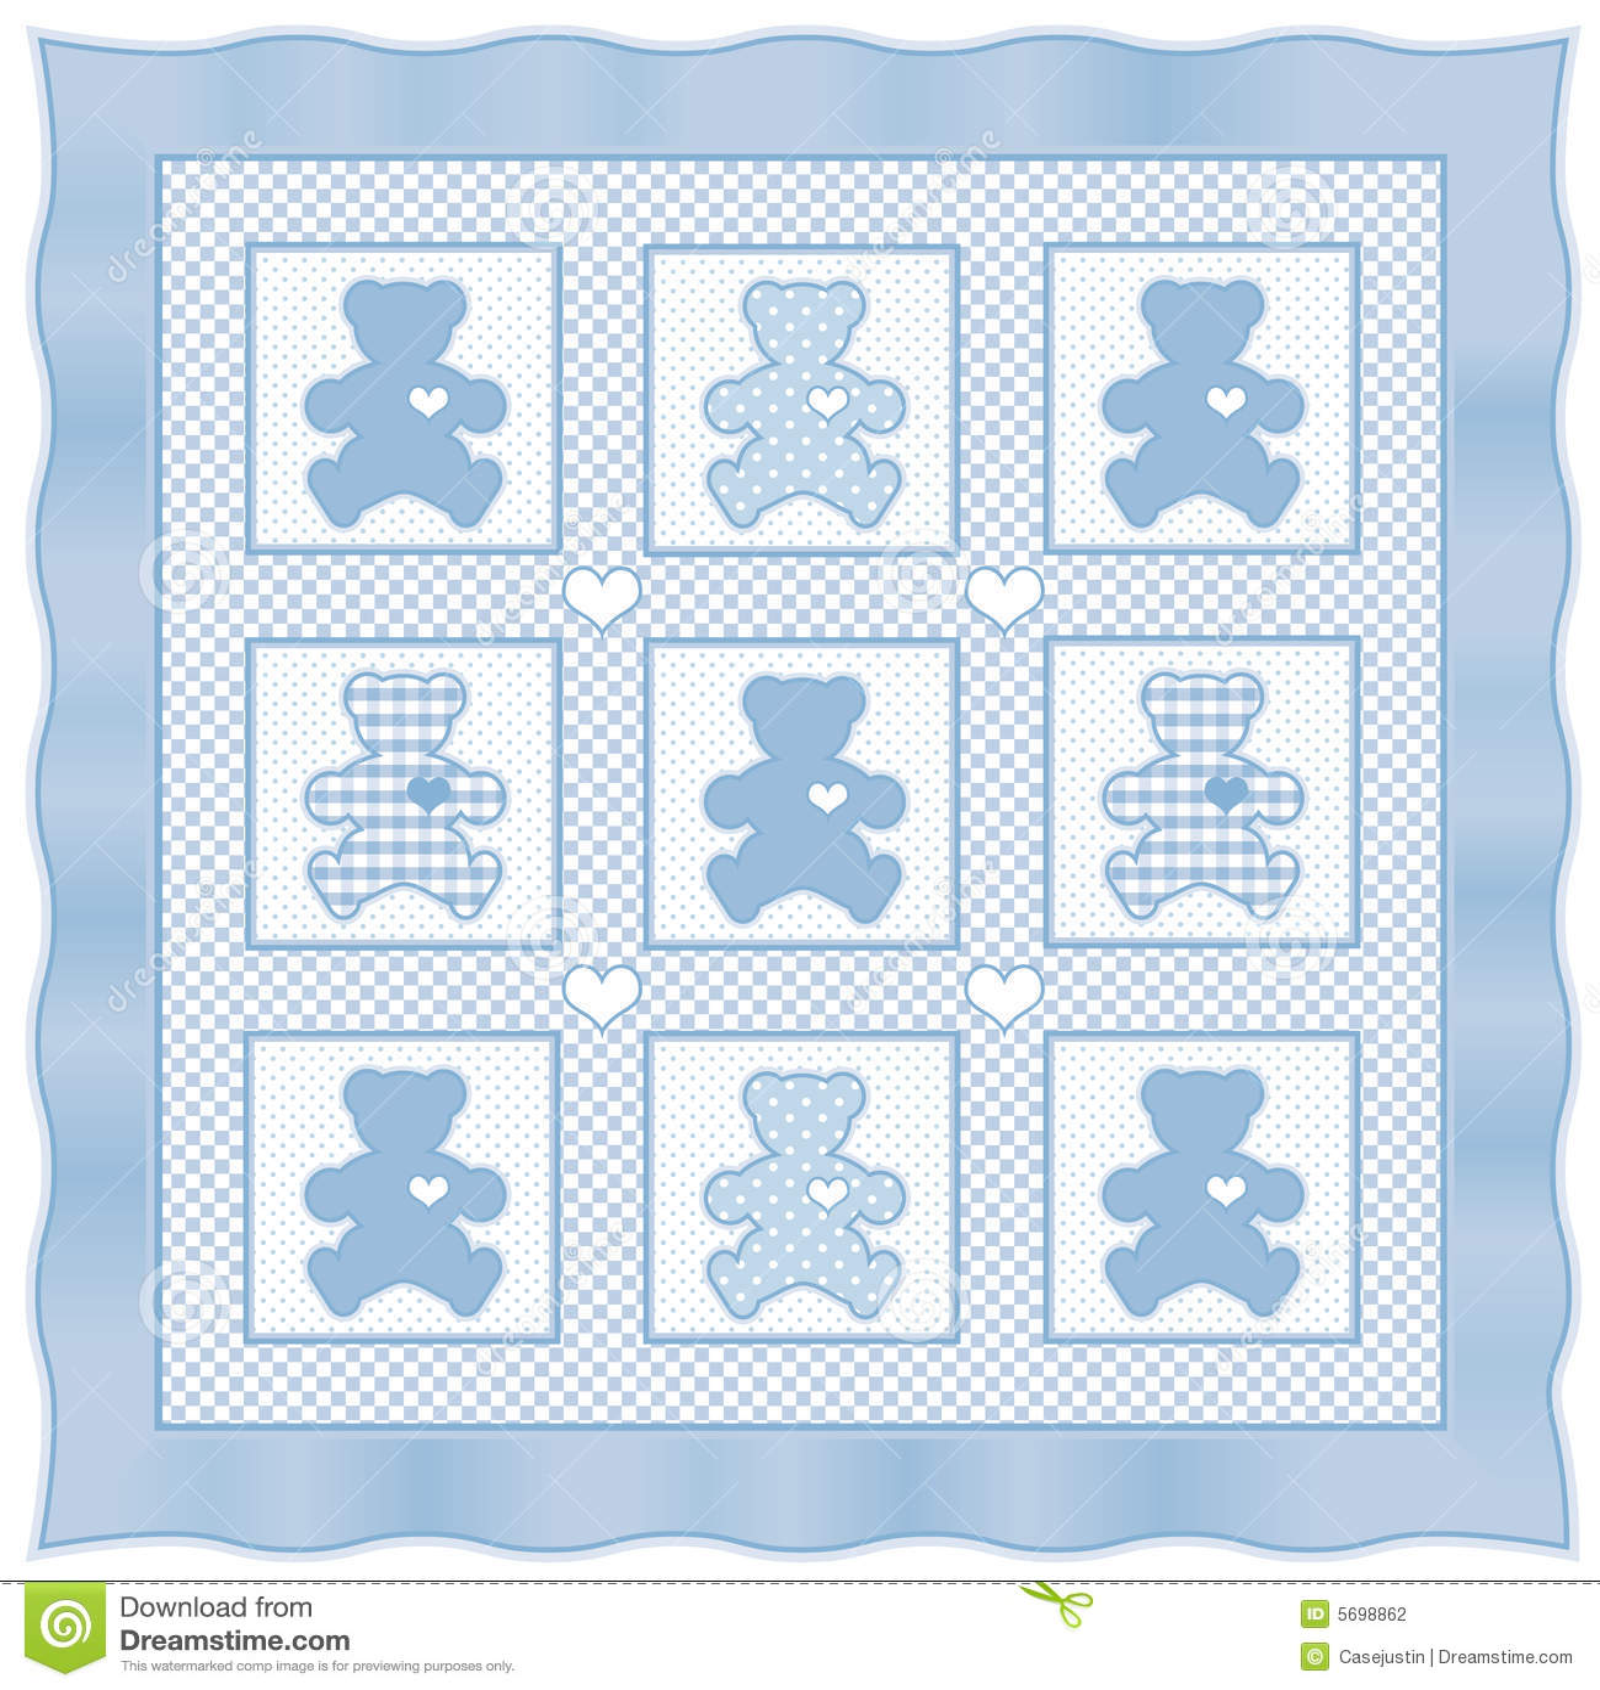 Teddy Bear Quilt Baby Blue Pastel Stock Vector Illustration Of